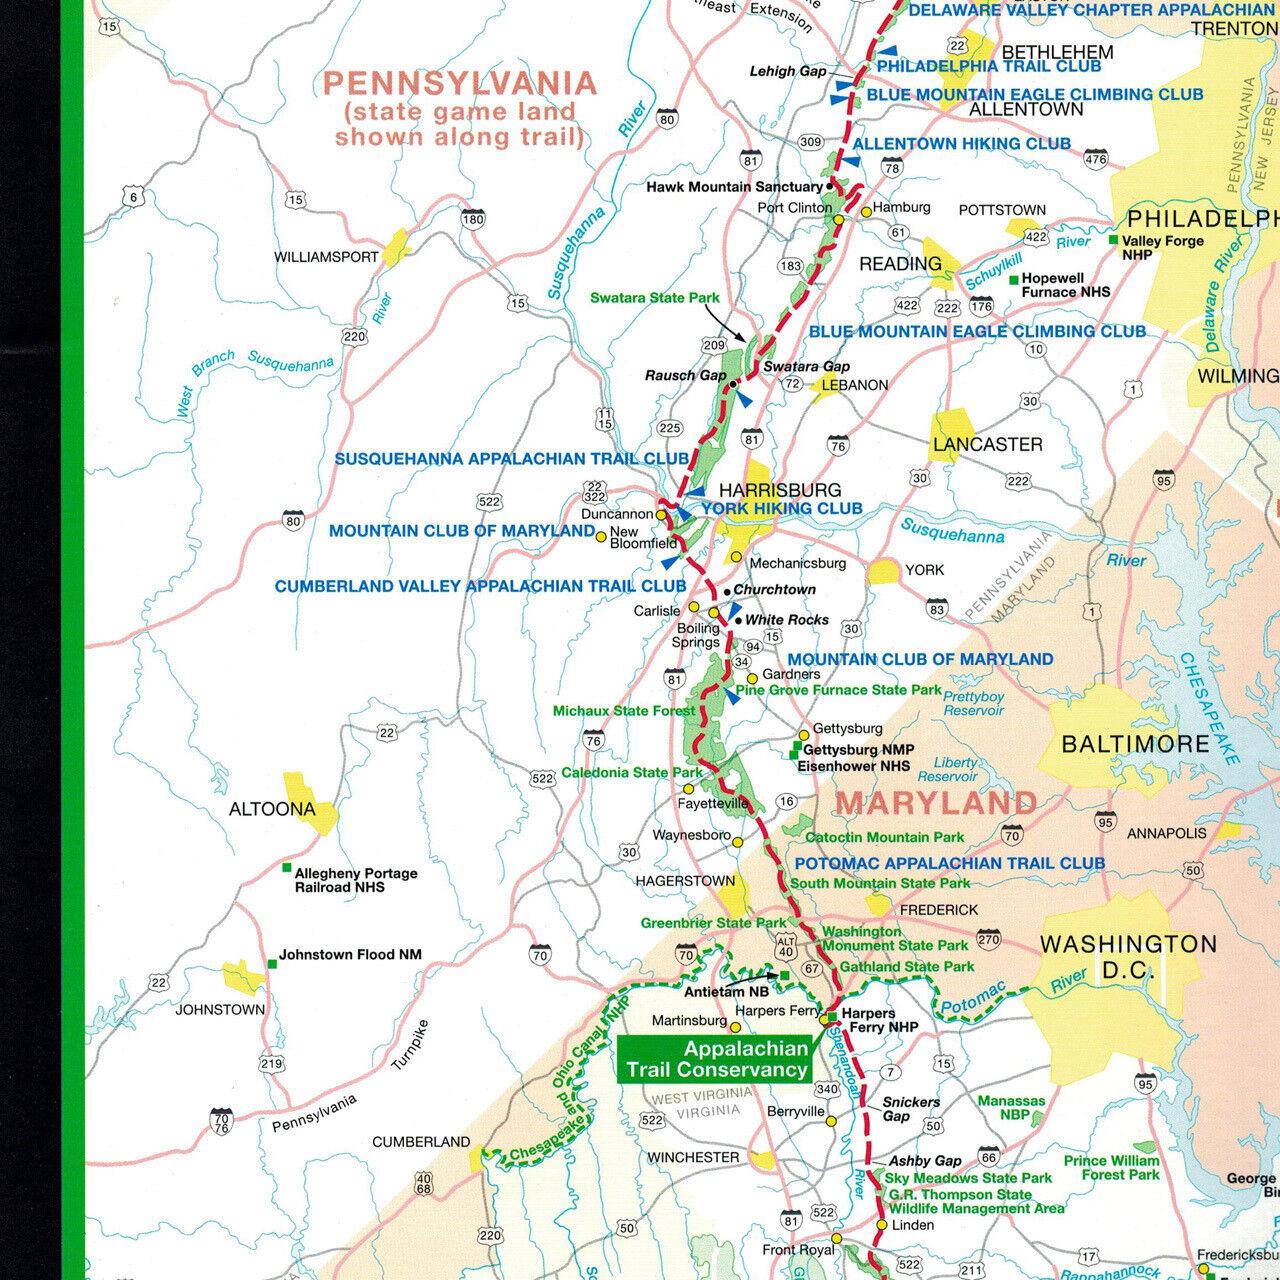 Appalachian Trail Conservancy 9 X 48 Inch Poster Strip Map